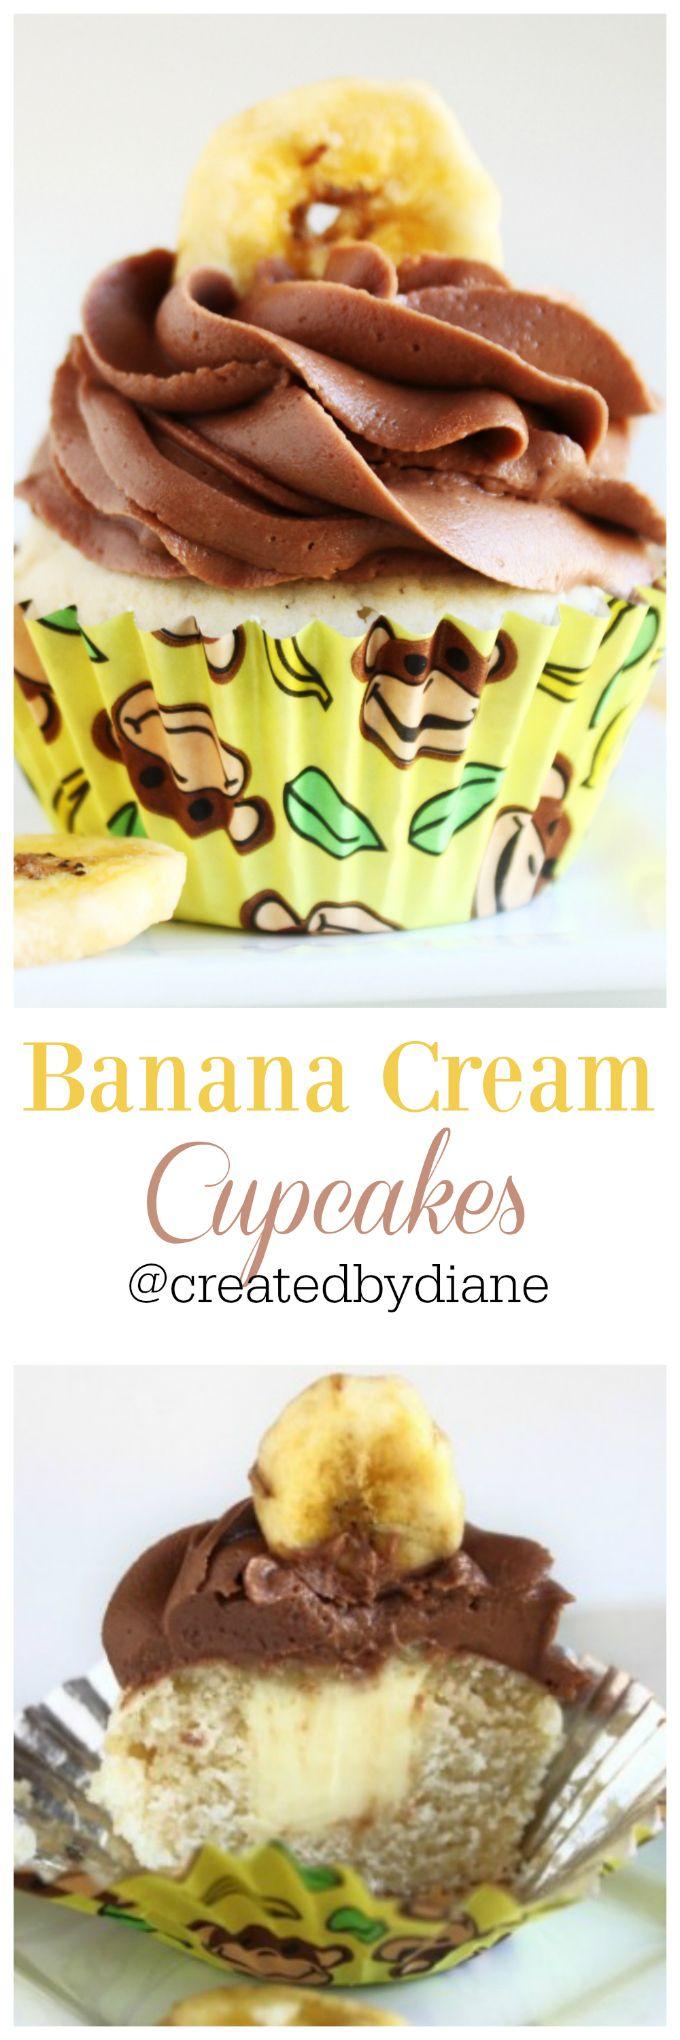 banana cream cupcakes @createdbydiane